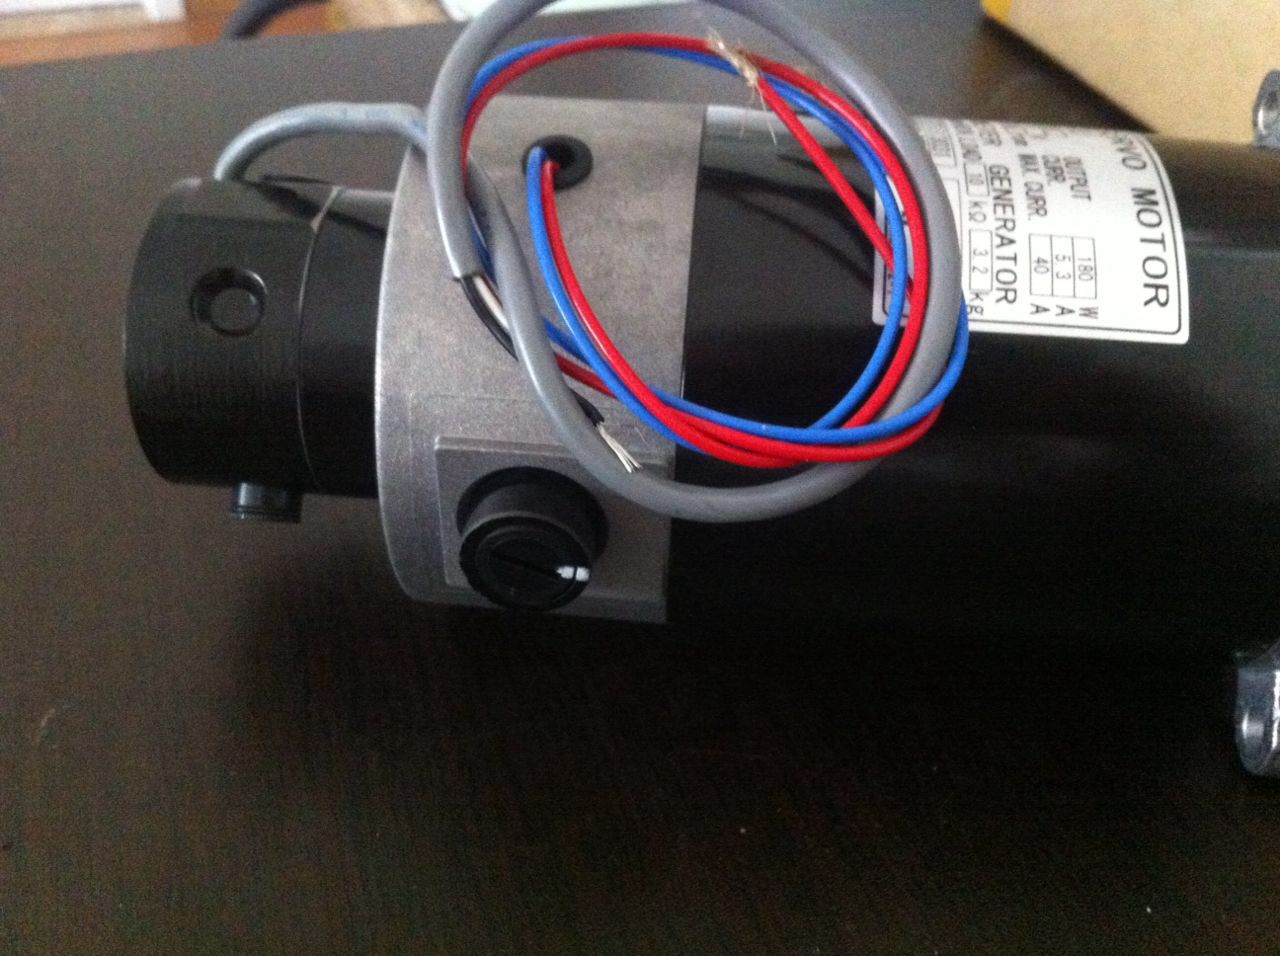 MC378周口市高价回收三菱工控设备